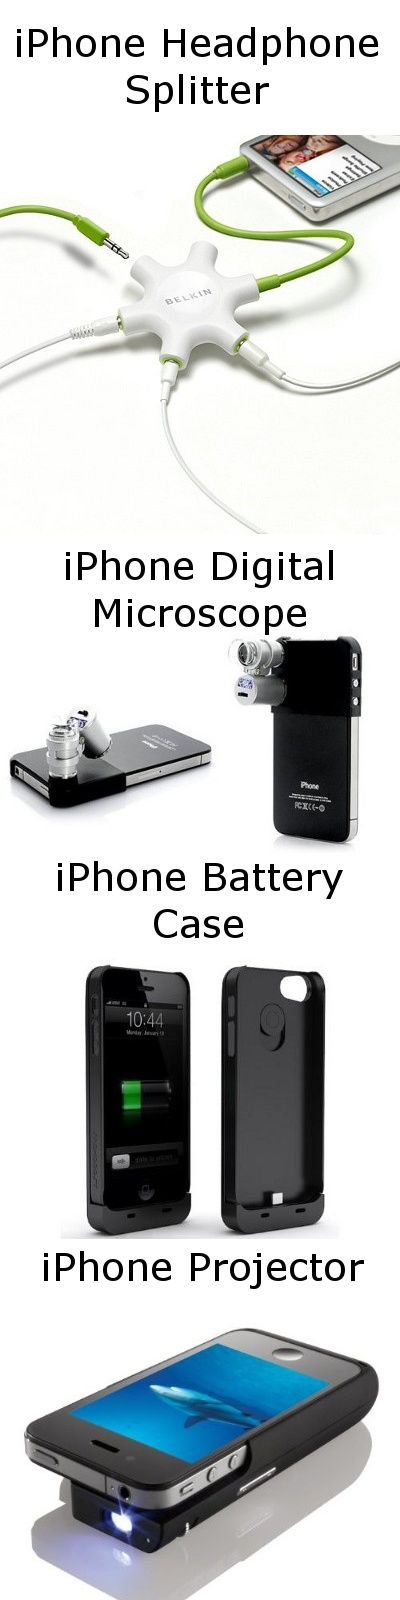 Manufacturer in China for Apple Accessories! http://www.alibaba.com/product-gs/314500263/2013_new_arrivel_universal_usb_solar.html?utm_content=bufferfc83c&utm_medium=social&utm_source=pinterest.com&utm_campaign=buffer